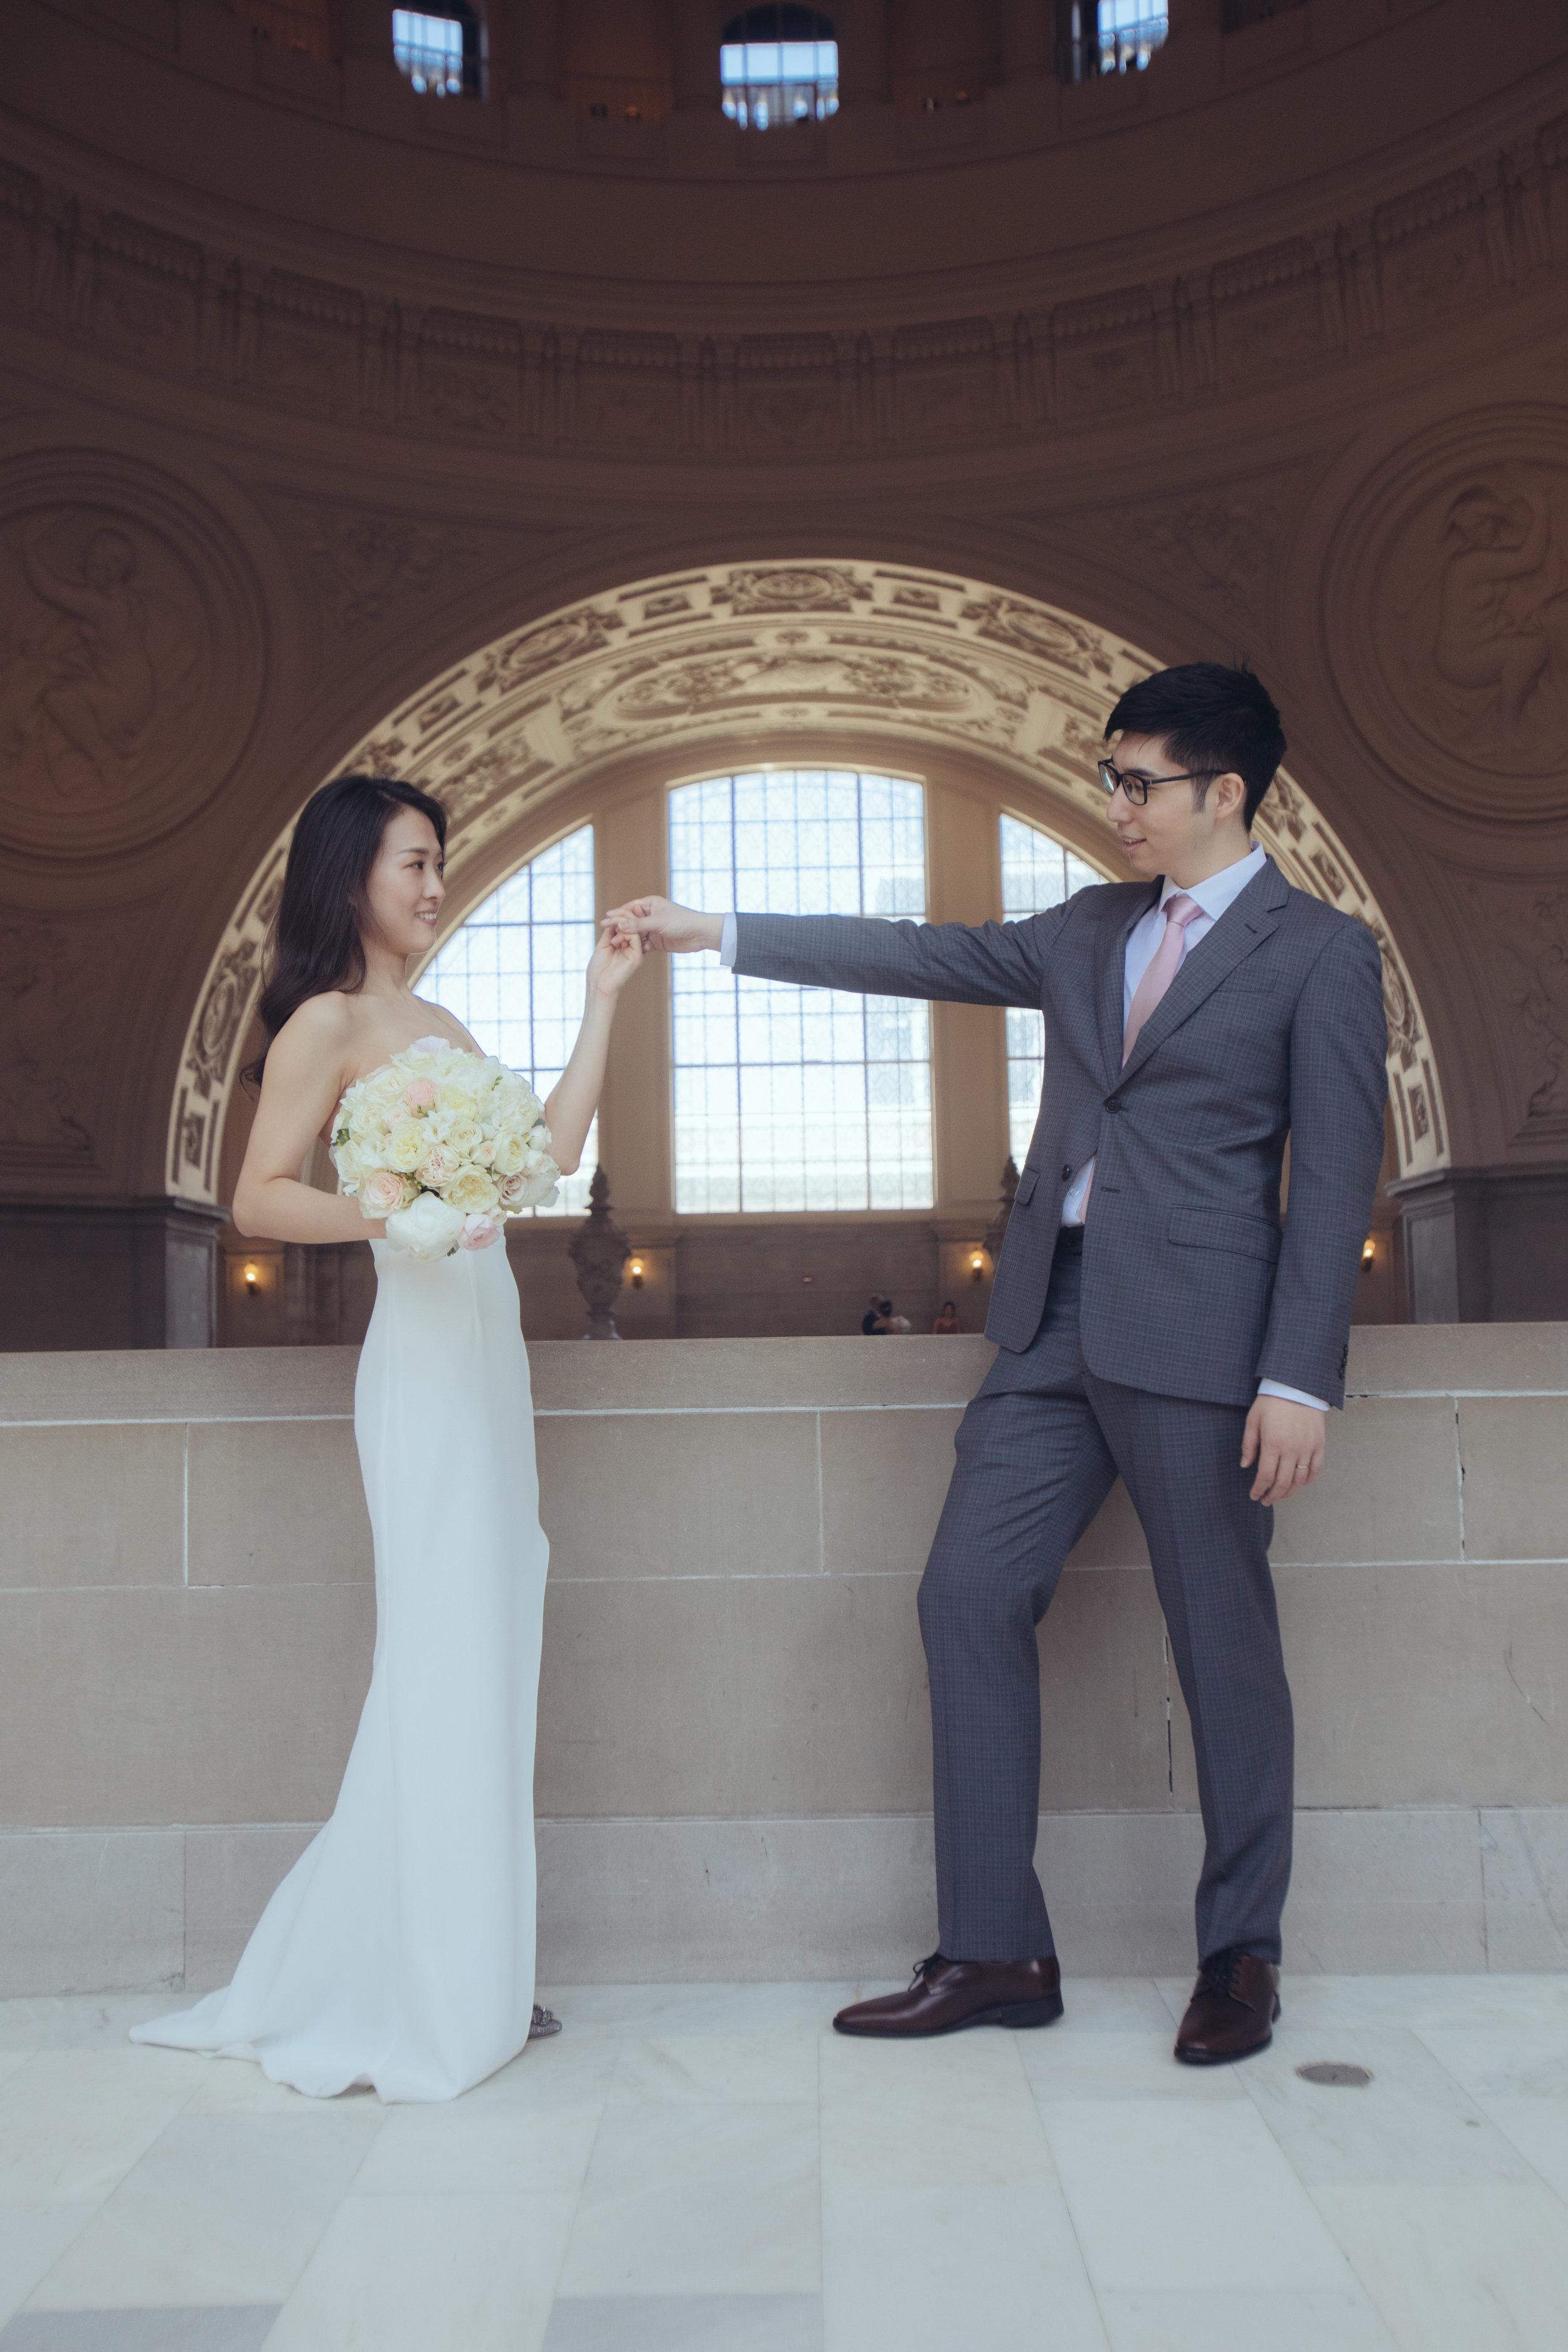 0130 Tongjing & Pufan.jpg